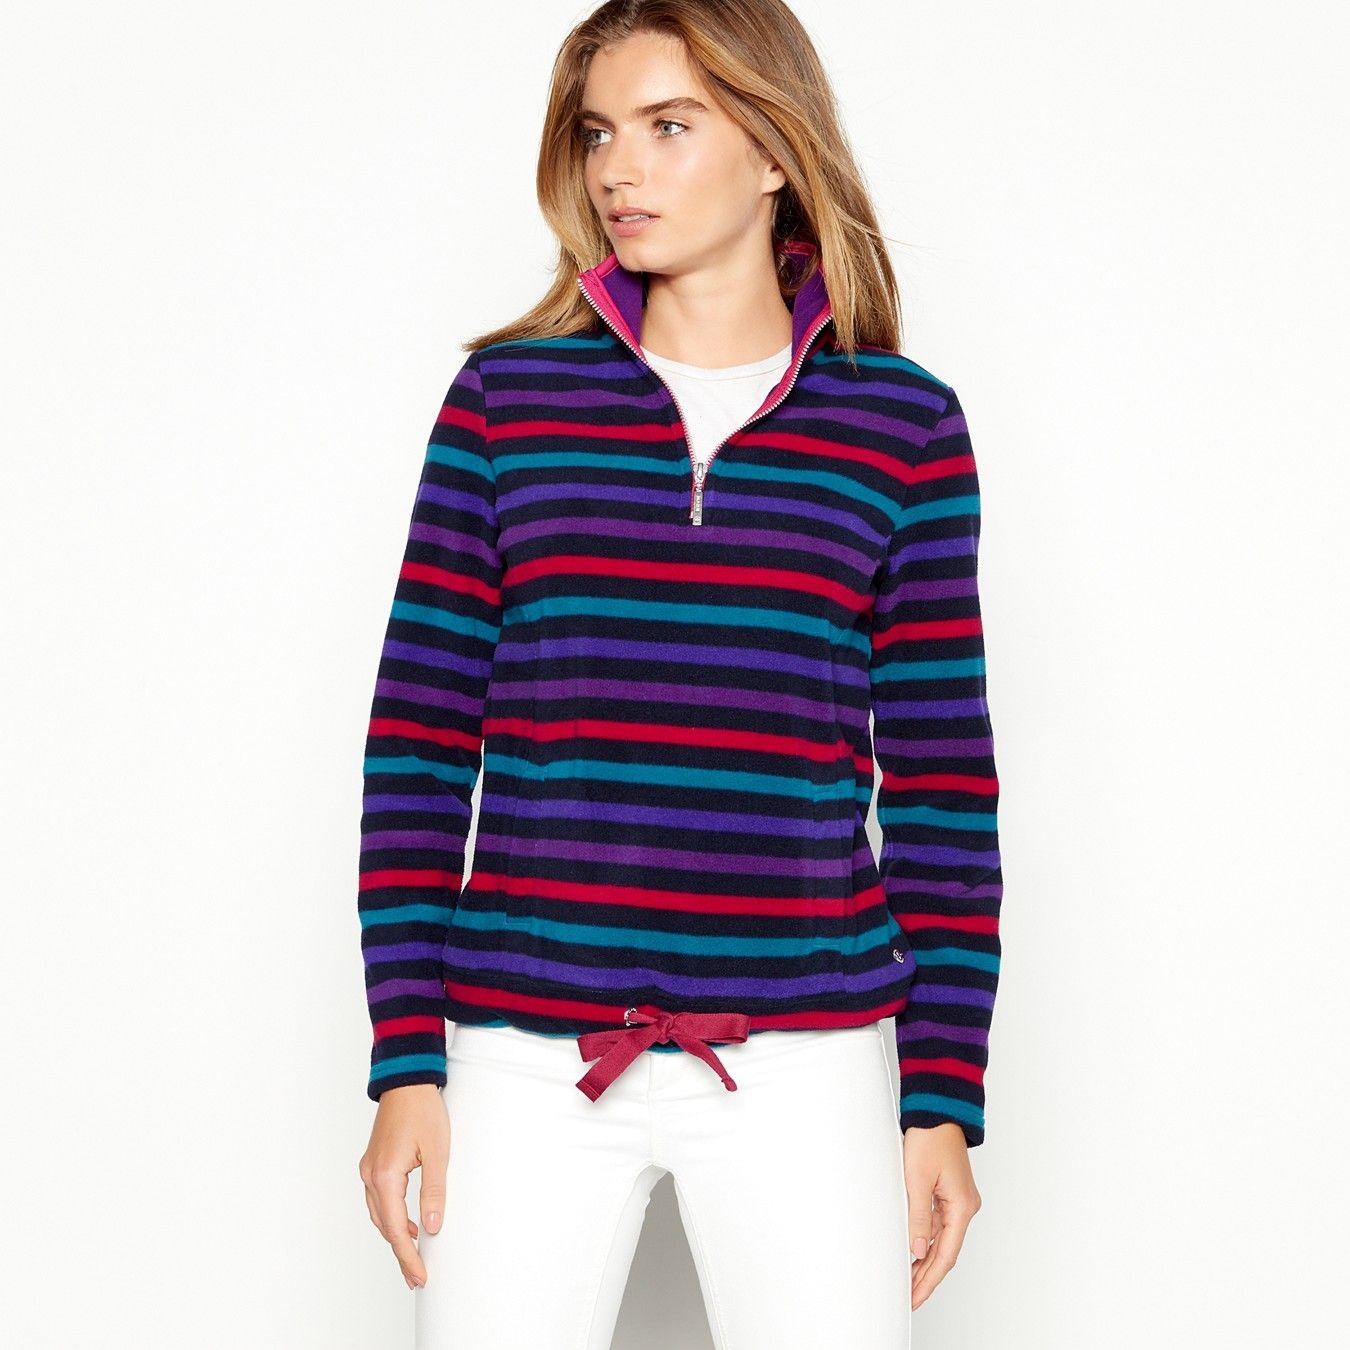 Navy Striped Half Zip Funnel Neck Fleece Clothes Clothes For Women Athletic Jacket [ 1350 x 1350 Pixel ]